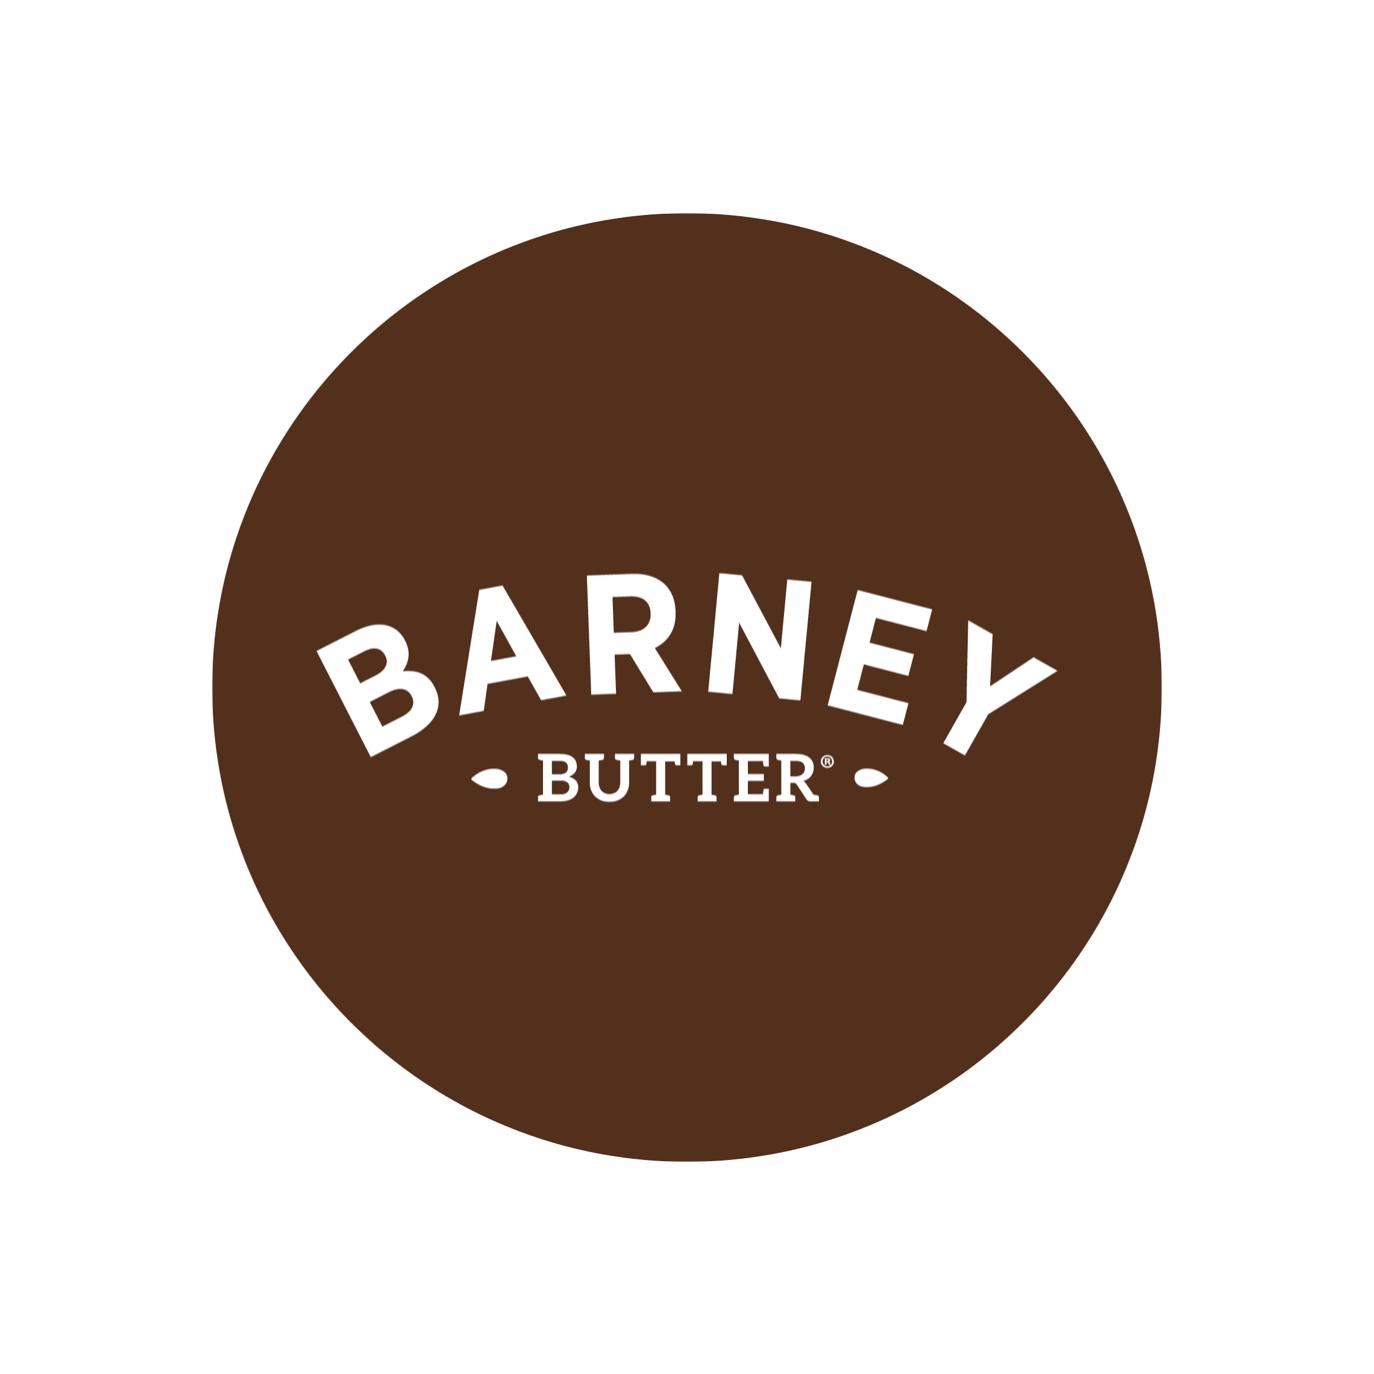 Barney Butter logo 1 - Certified Paleo, KETO Certified, & PaleoVegan by the Paleo Foundation